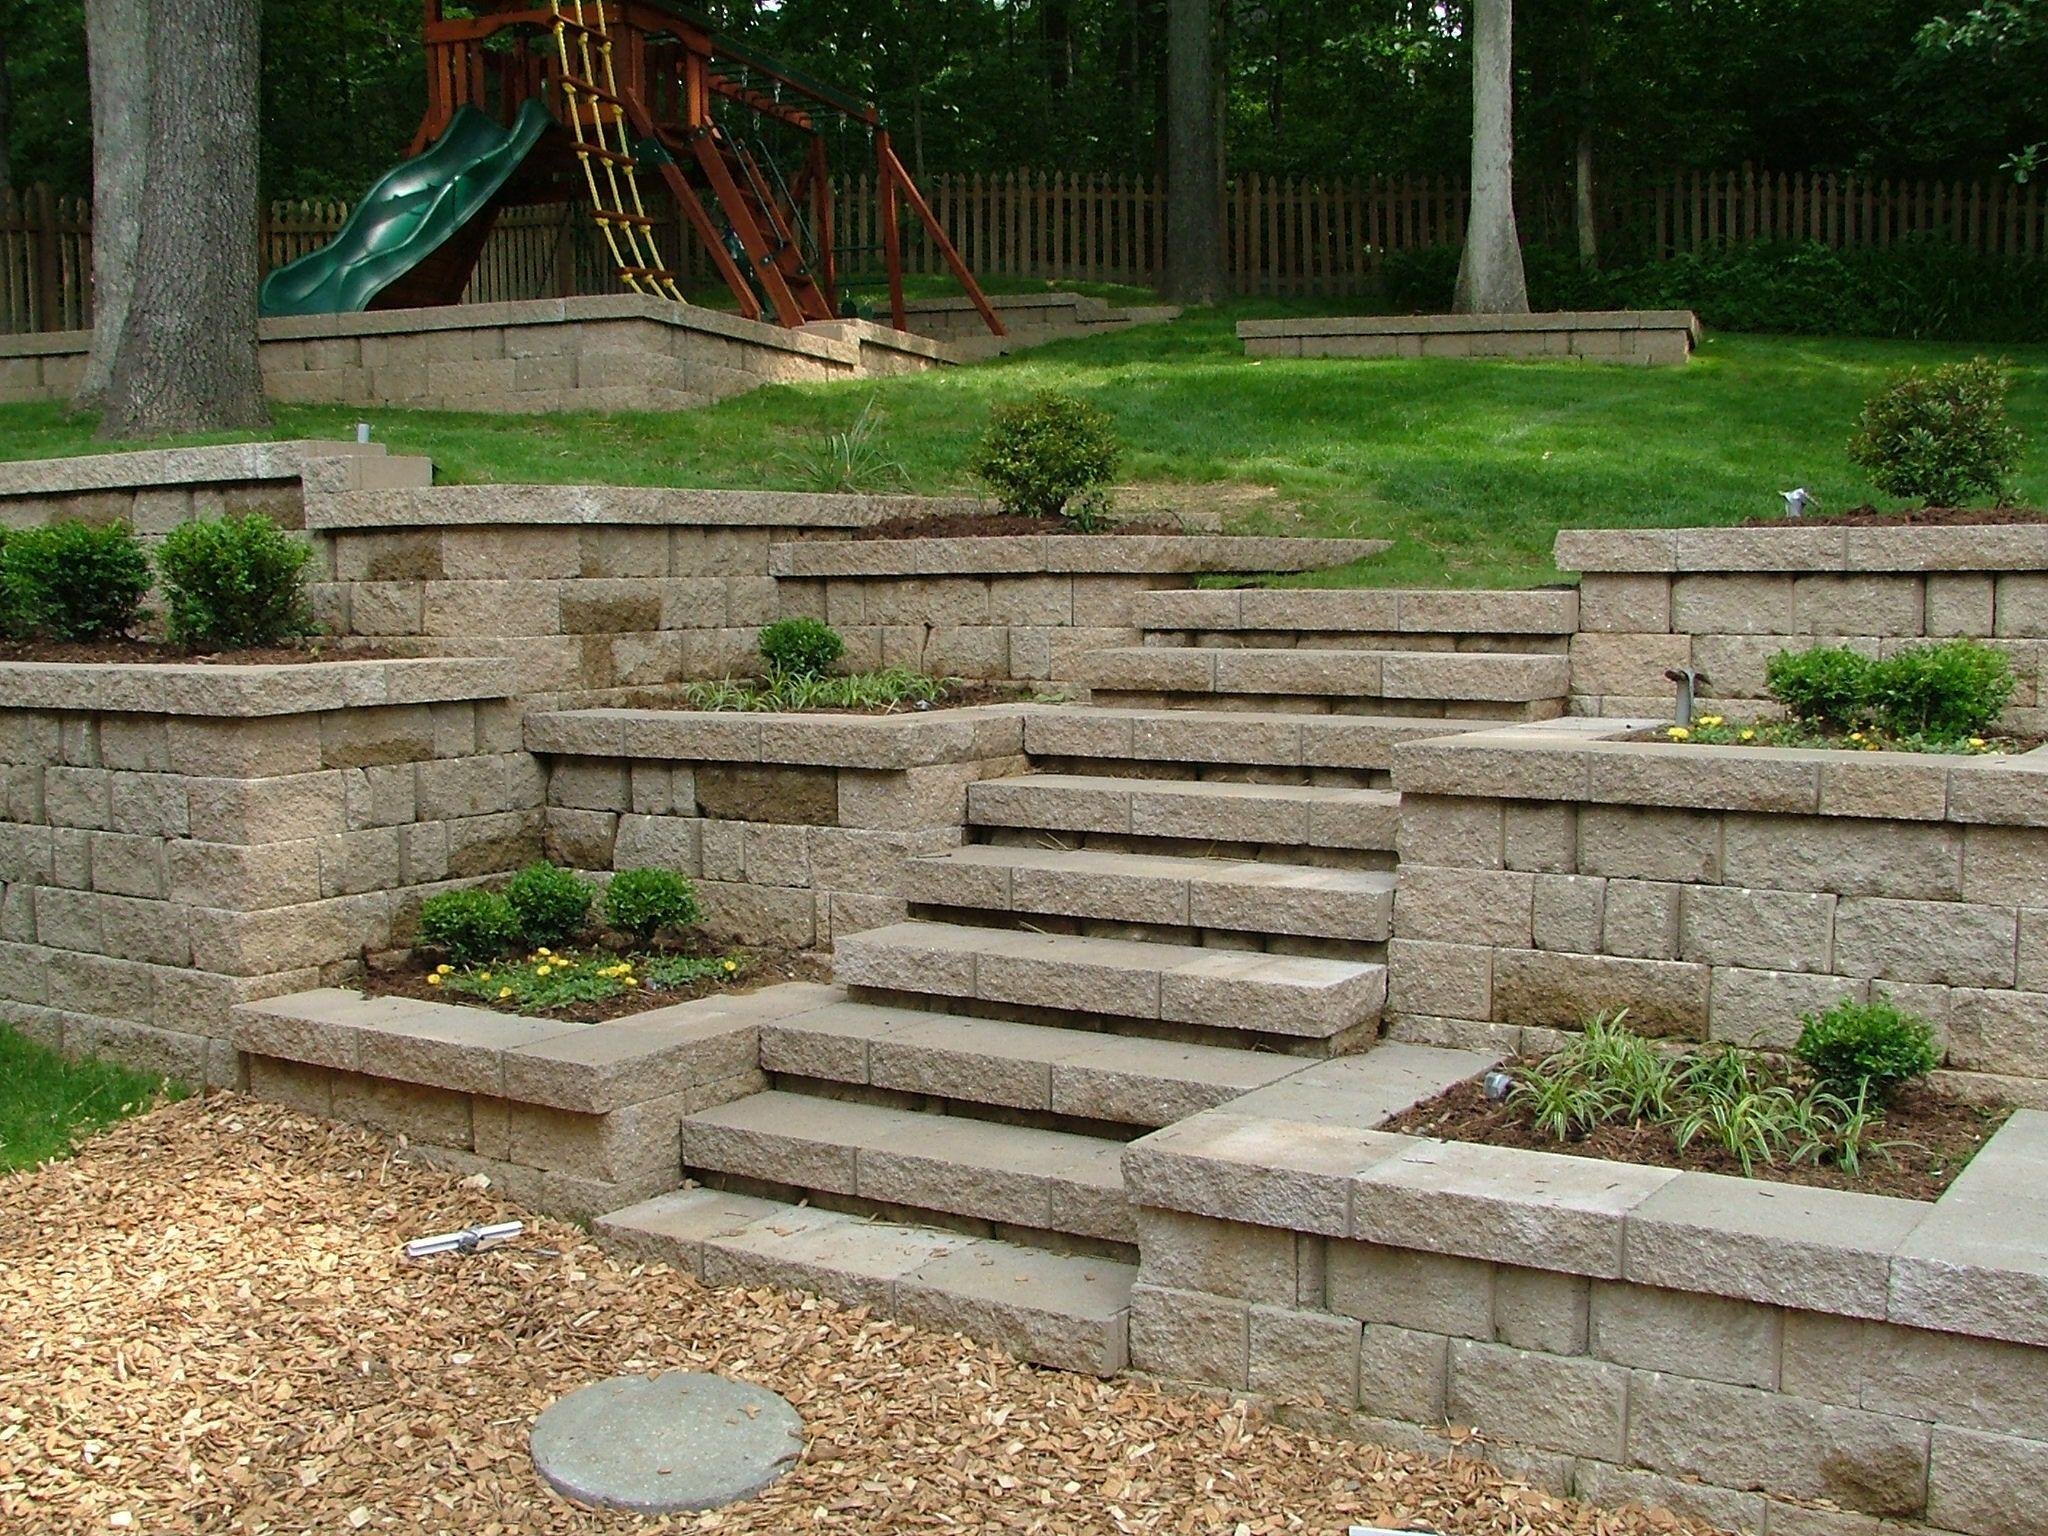 Backyard Designs With Retaining Walls best 20 wood retaining wall ideas on pinterest garden retaining wall sleeper wall and sleeper steps Retaining Wall Steps Album 2